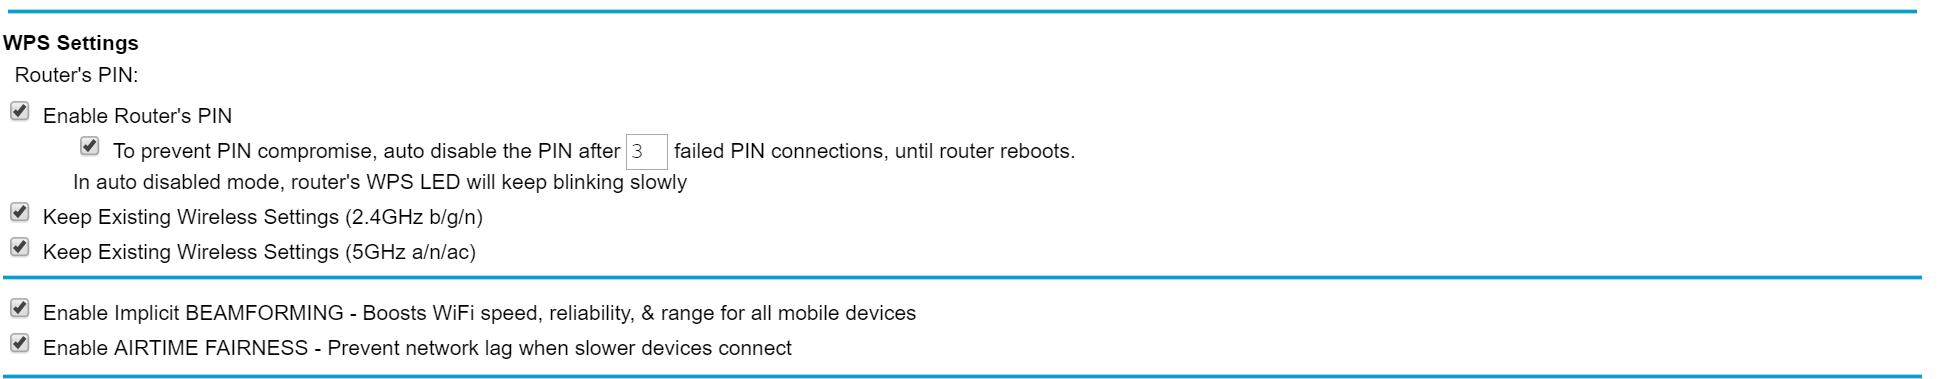 Nighthawk AC1900 (R7000) Slow WiFi Download Speeds - NETGEAR